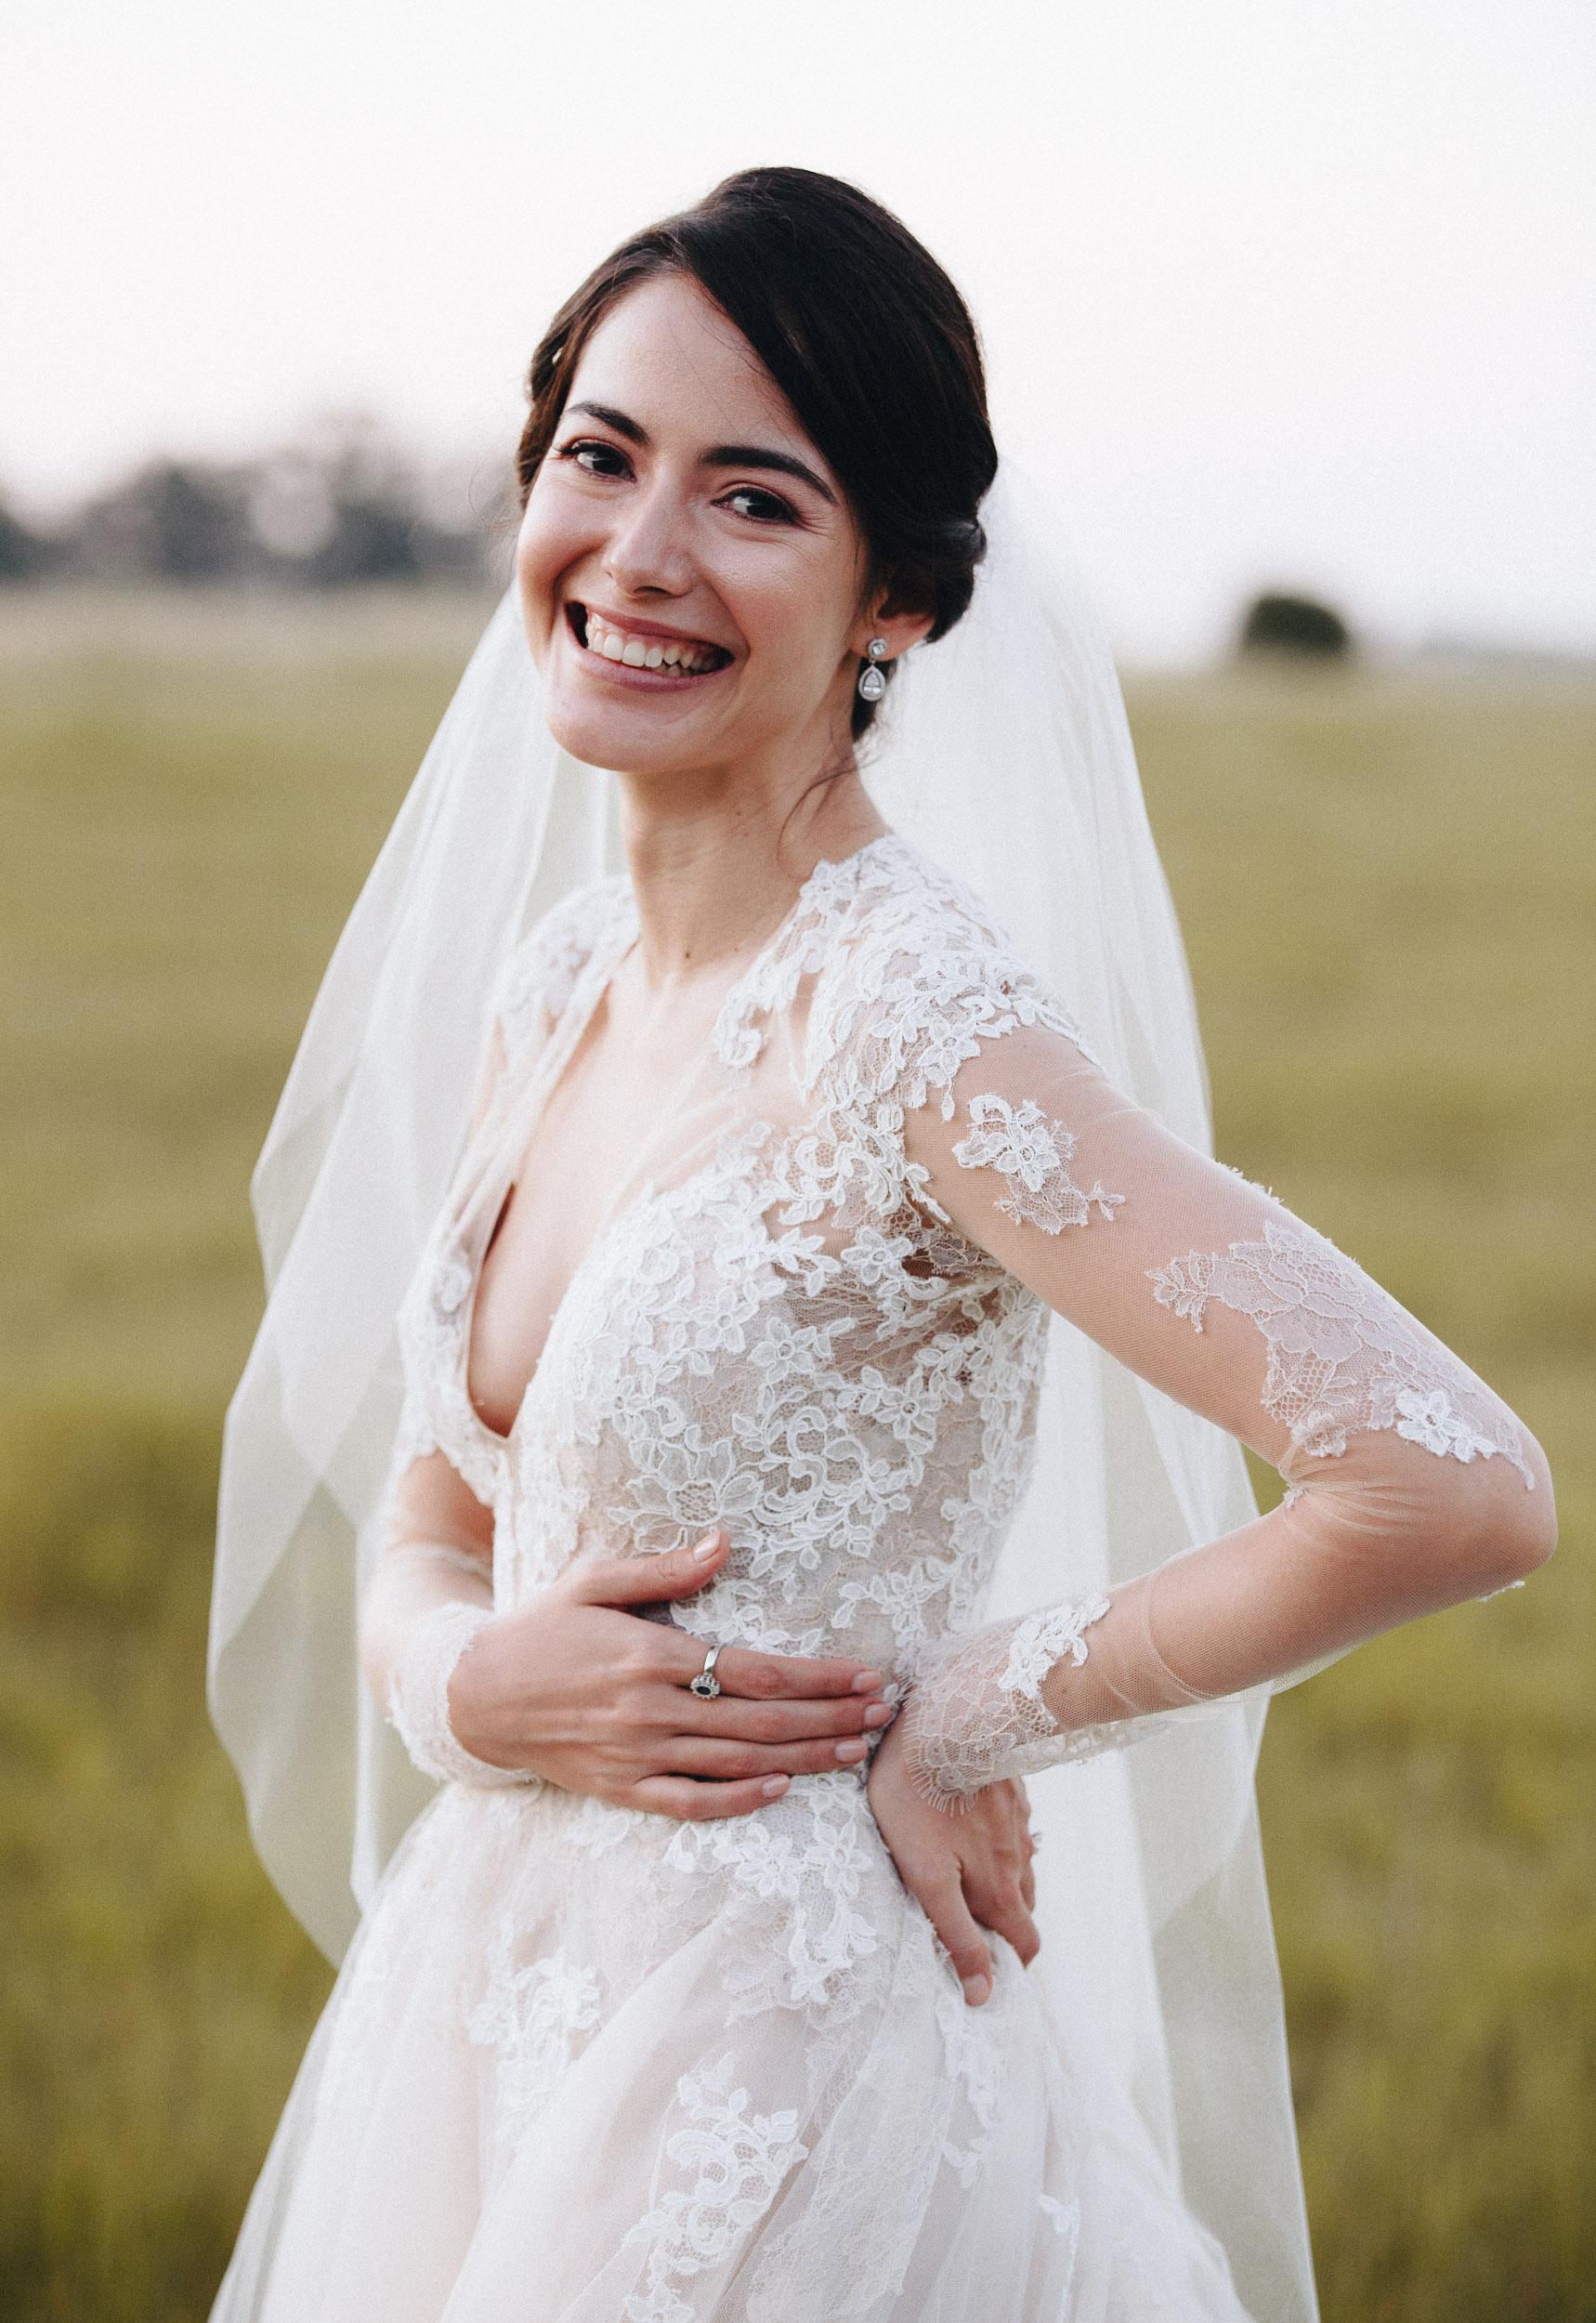 Jenny-Rockett-John-Scranton-Cape-Town-Wedding-Photographer-Andrea-Kellan-198.jpg